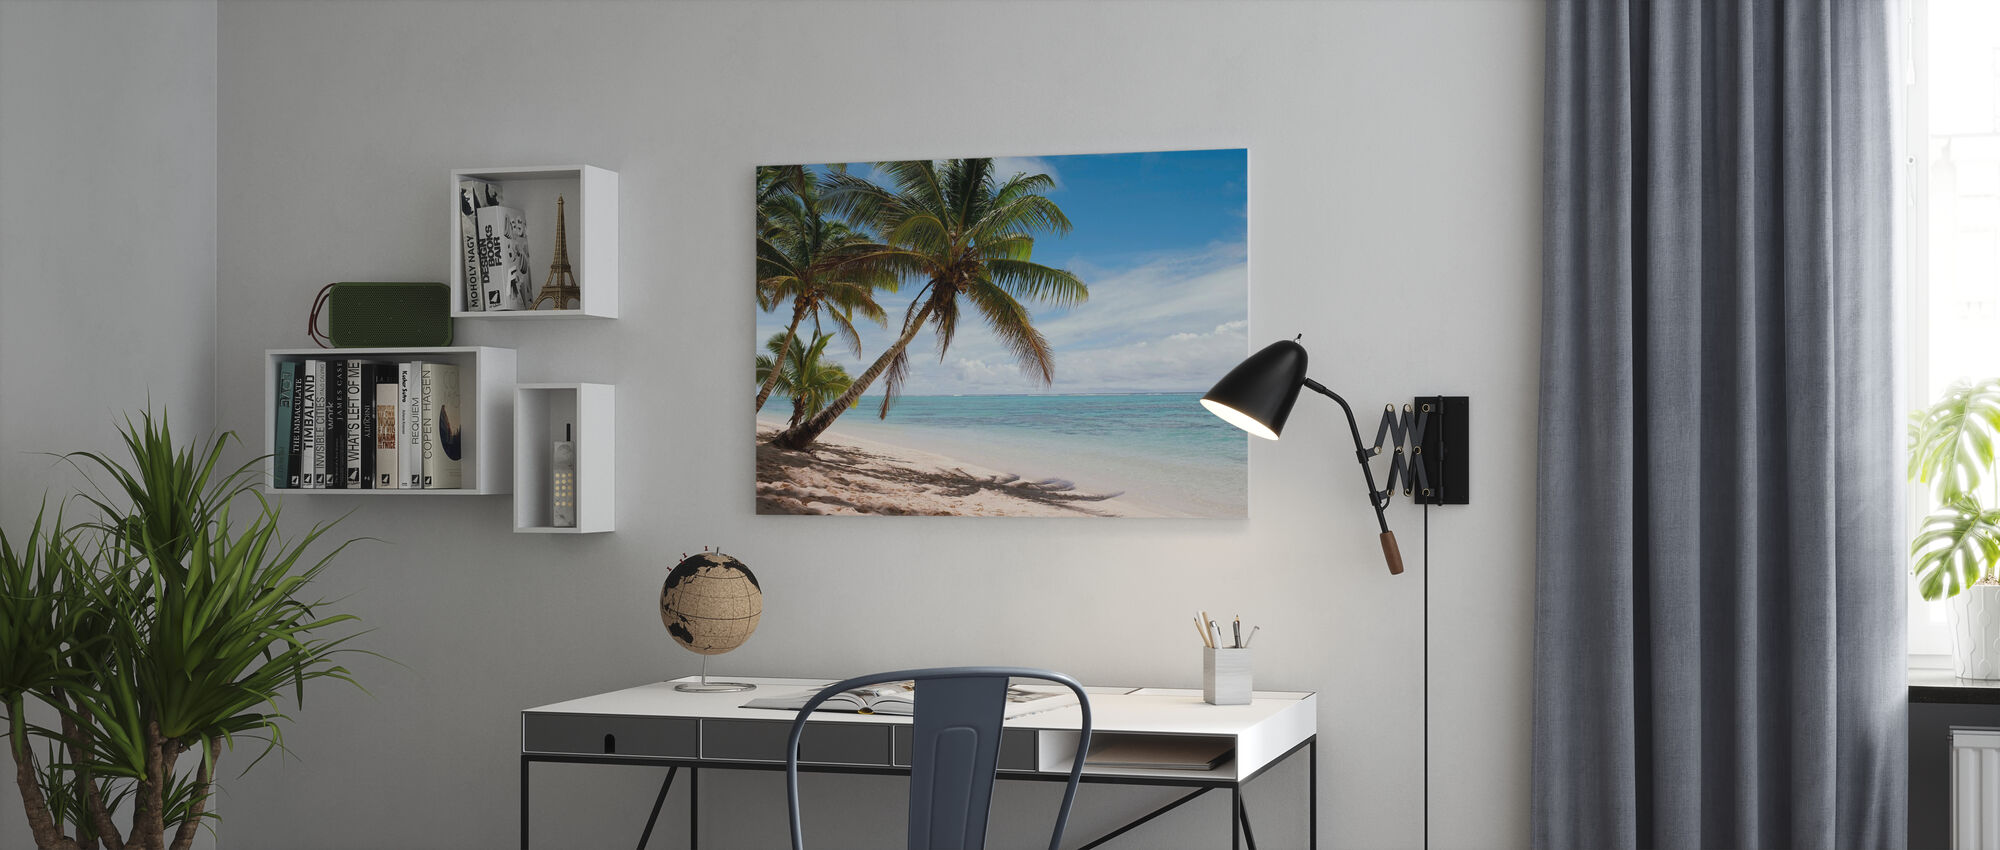 Tropical Beach Scene - Canvas print - Office